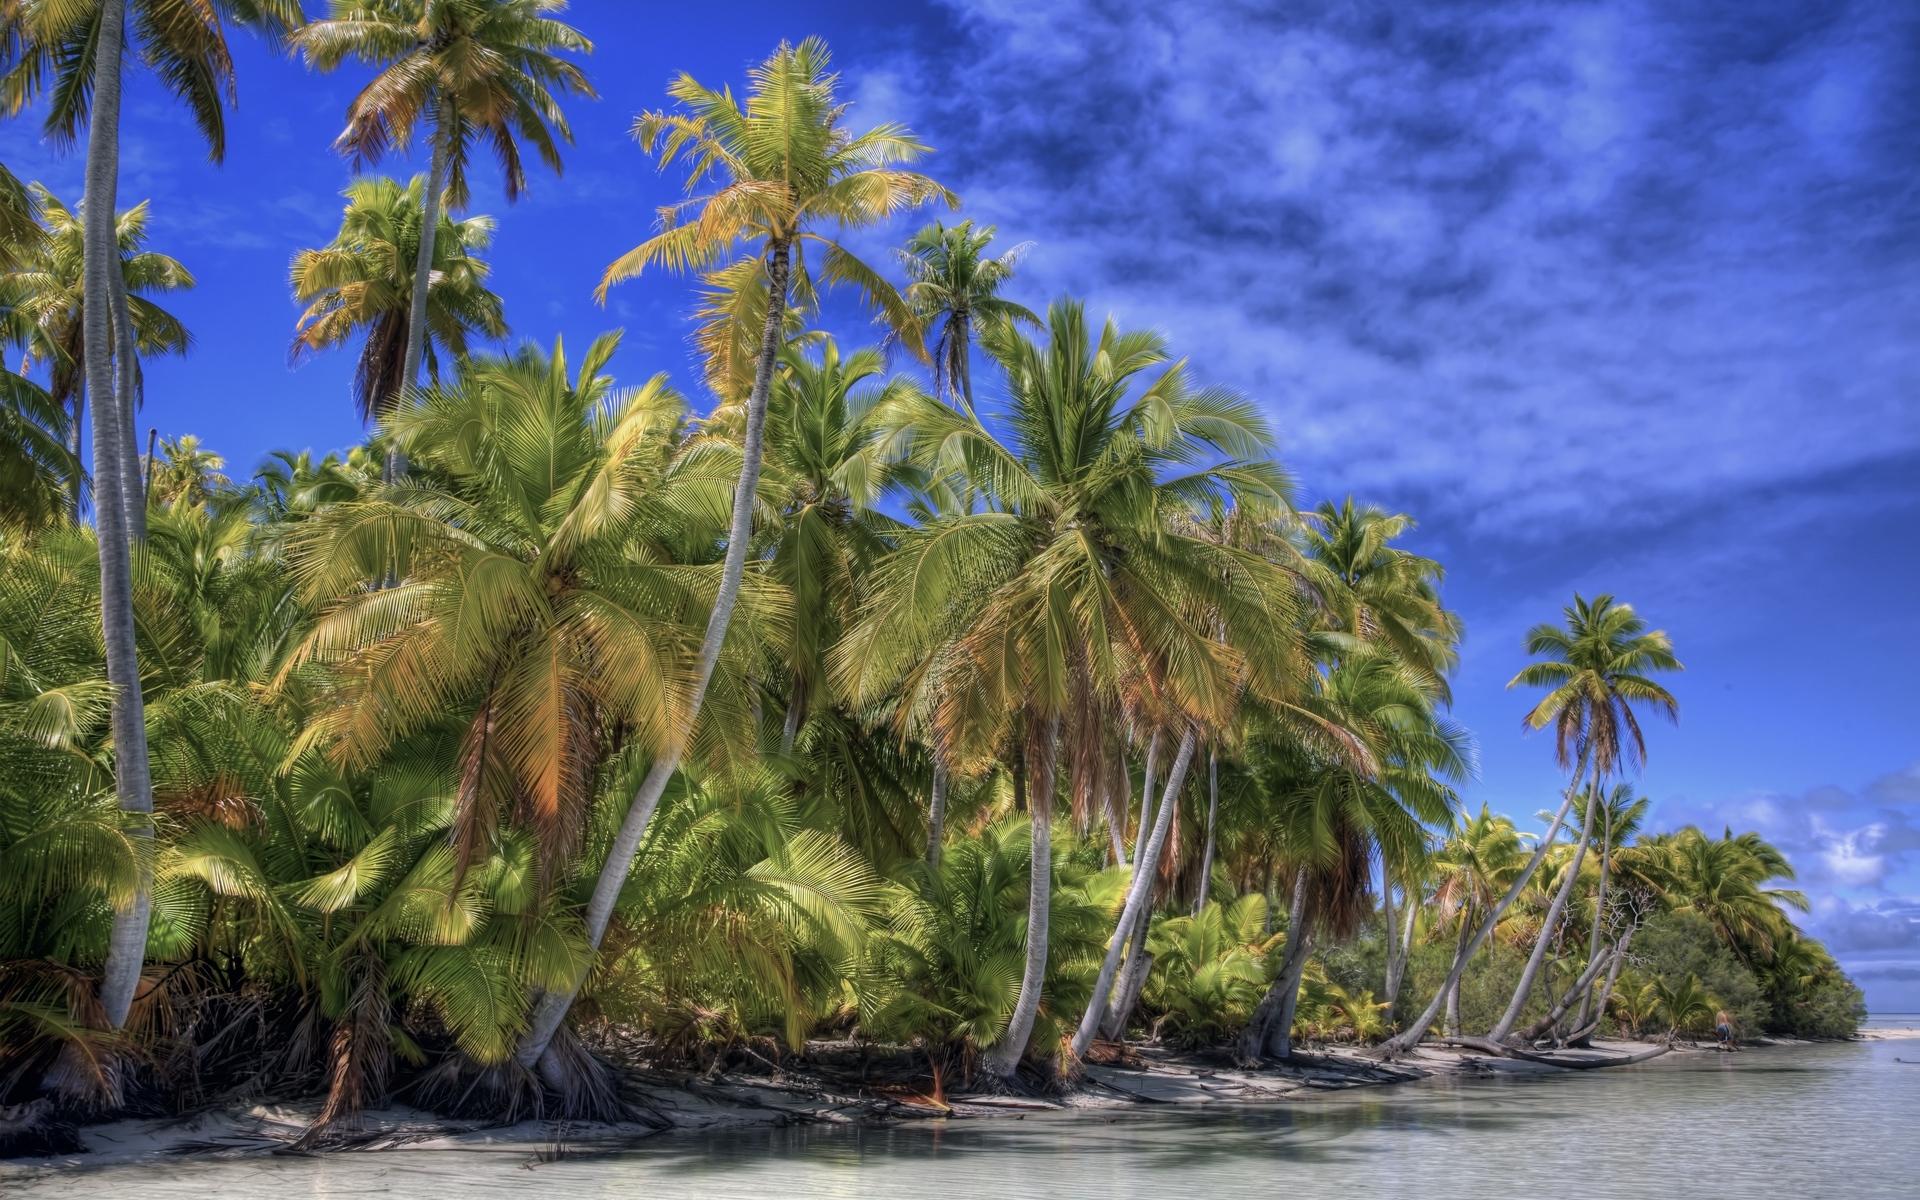 Картинки Пальмы, желтый, берег, небо, синий фото и обои на рабочий стол